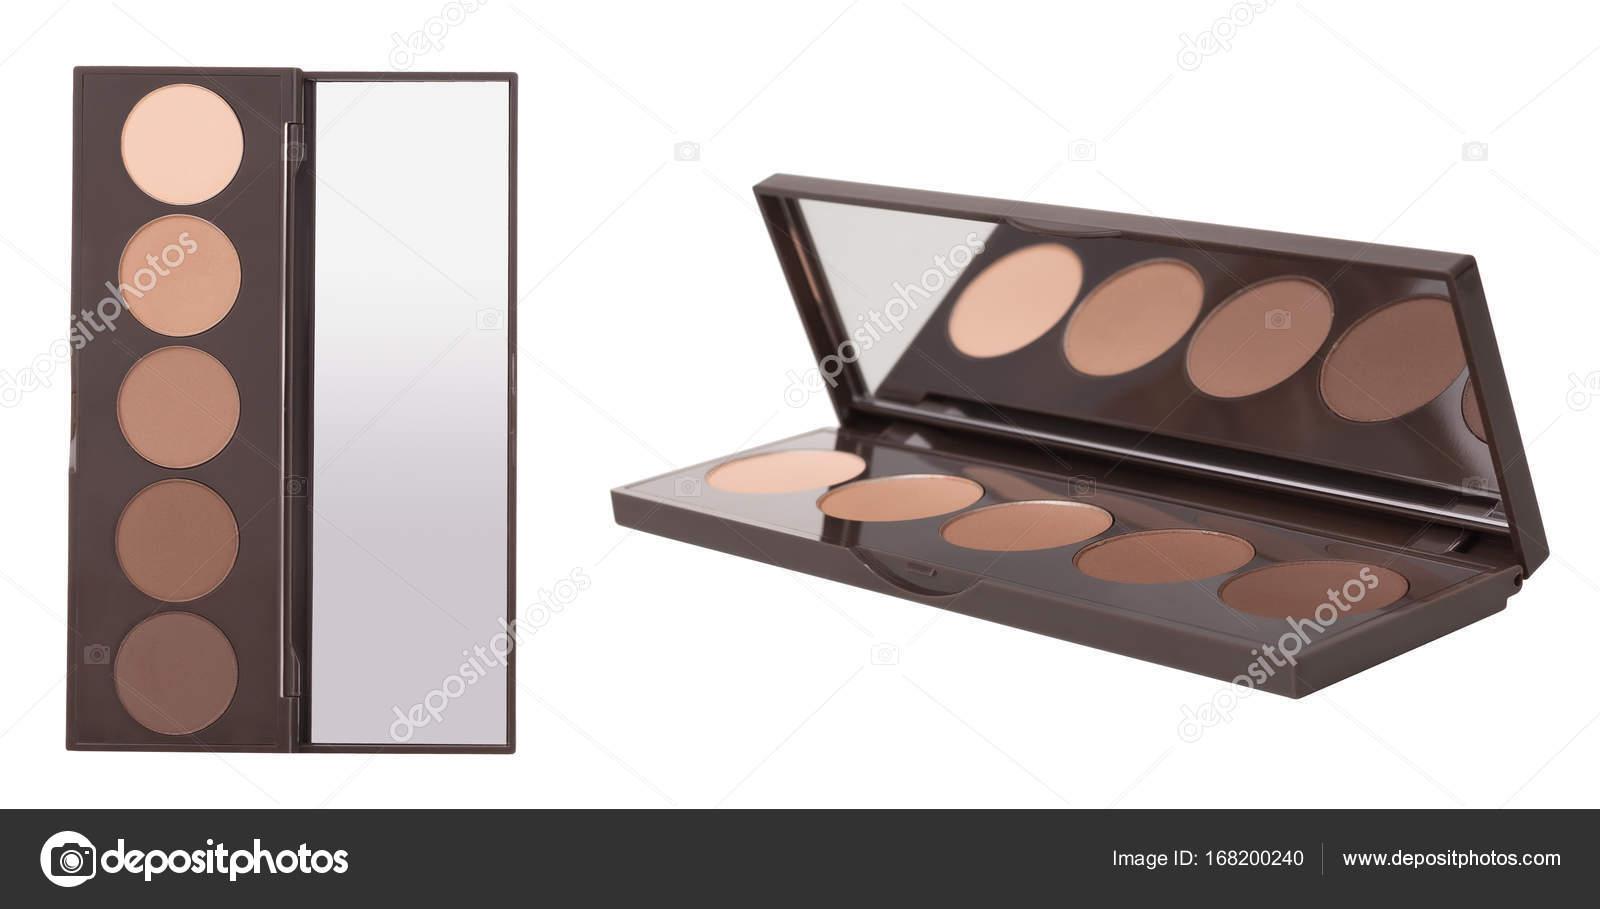 Spiegel Make Up : Make up spiegel puder lidschatten u stockfoto miho